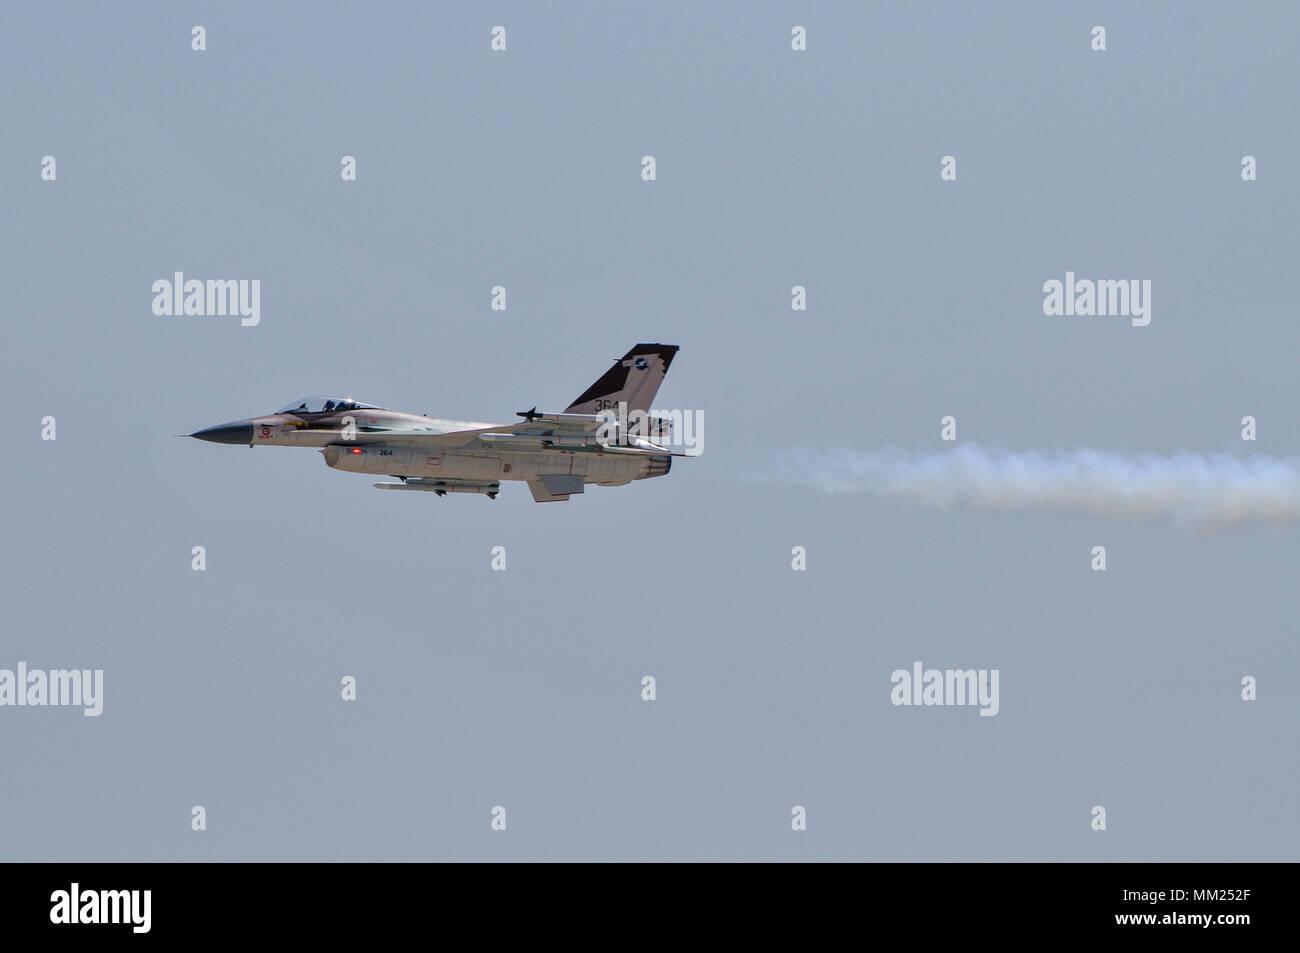 Radio controlled model aircraft demonstration at the IAF Air Show, Haifa, Israel - Stock Image